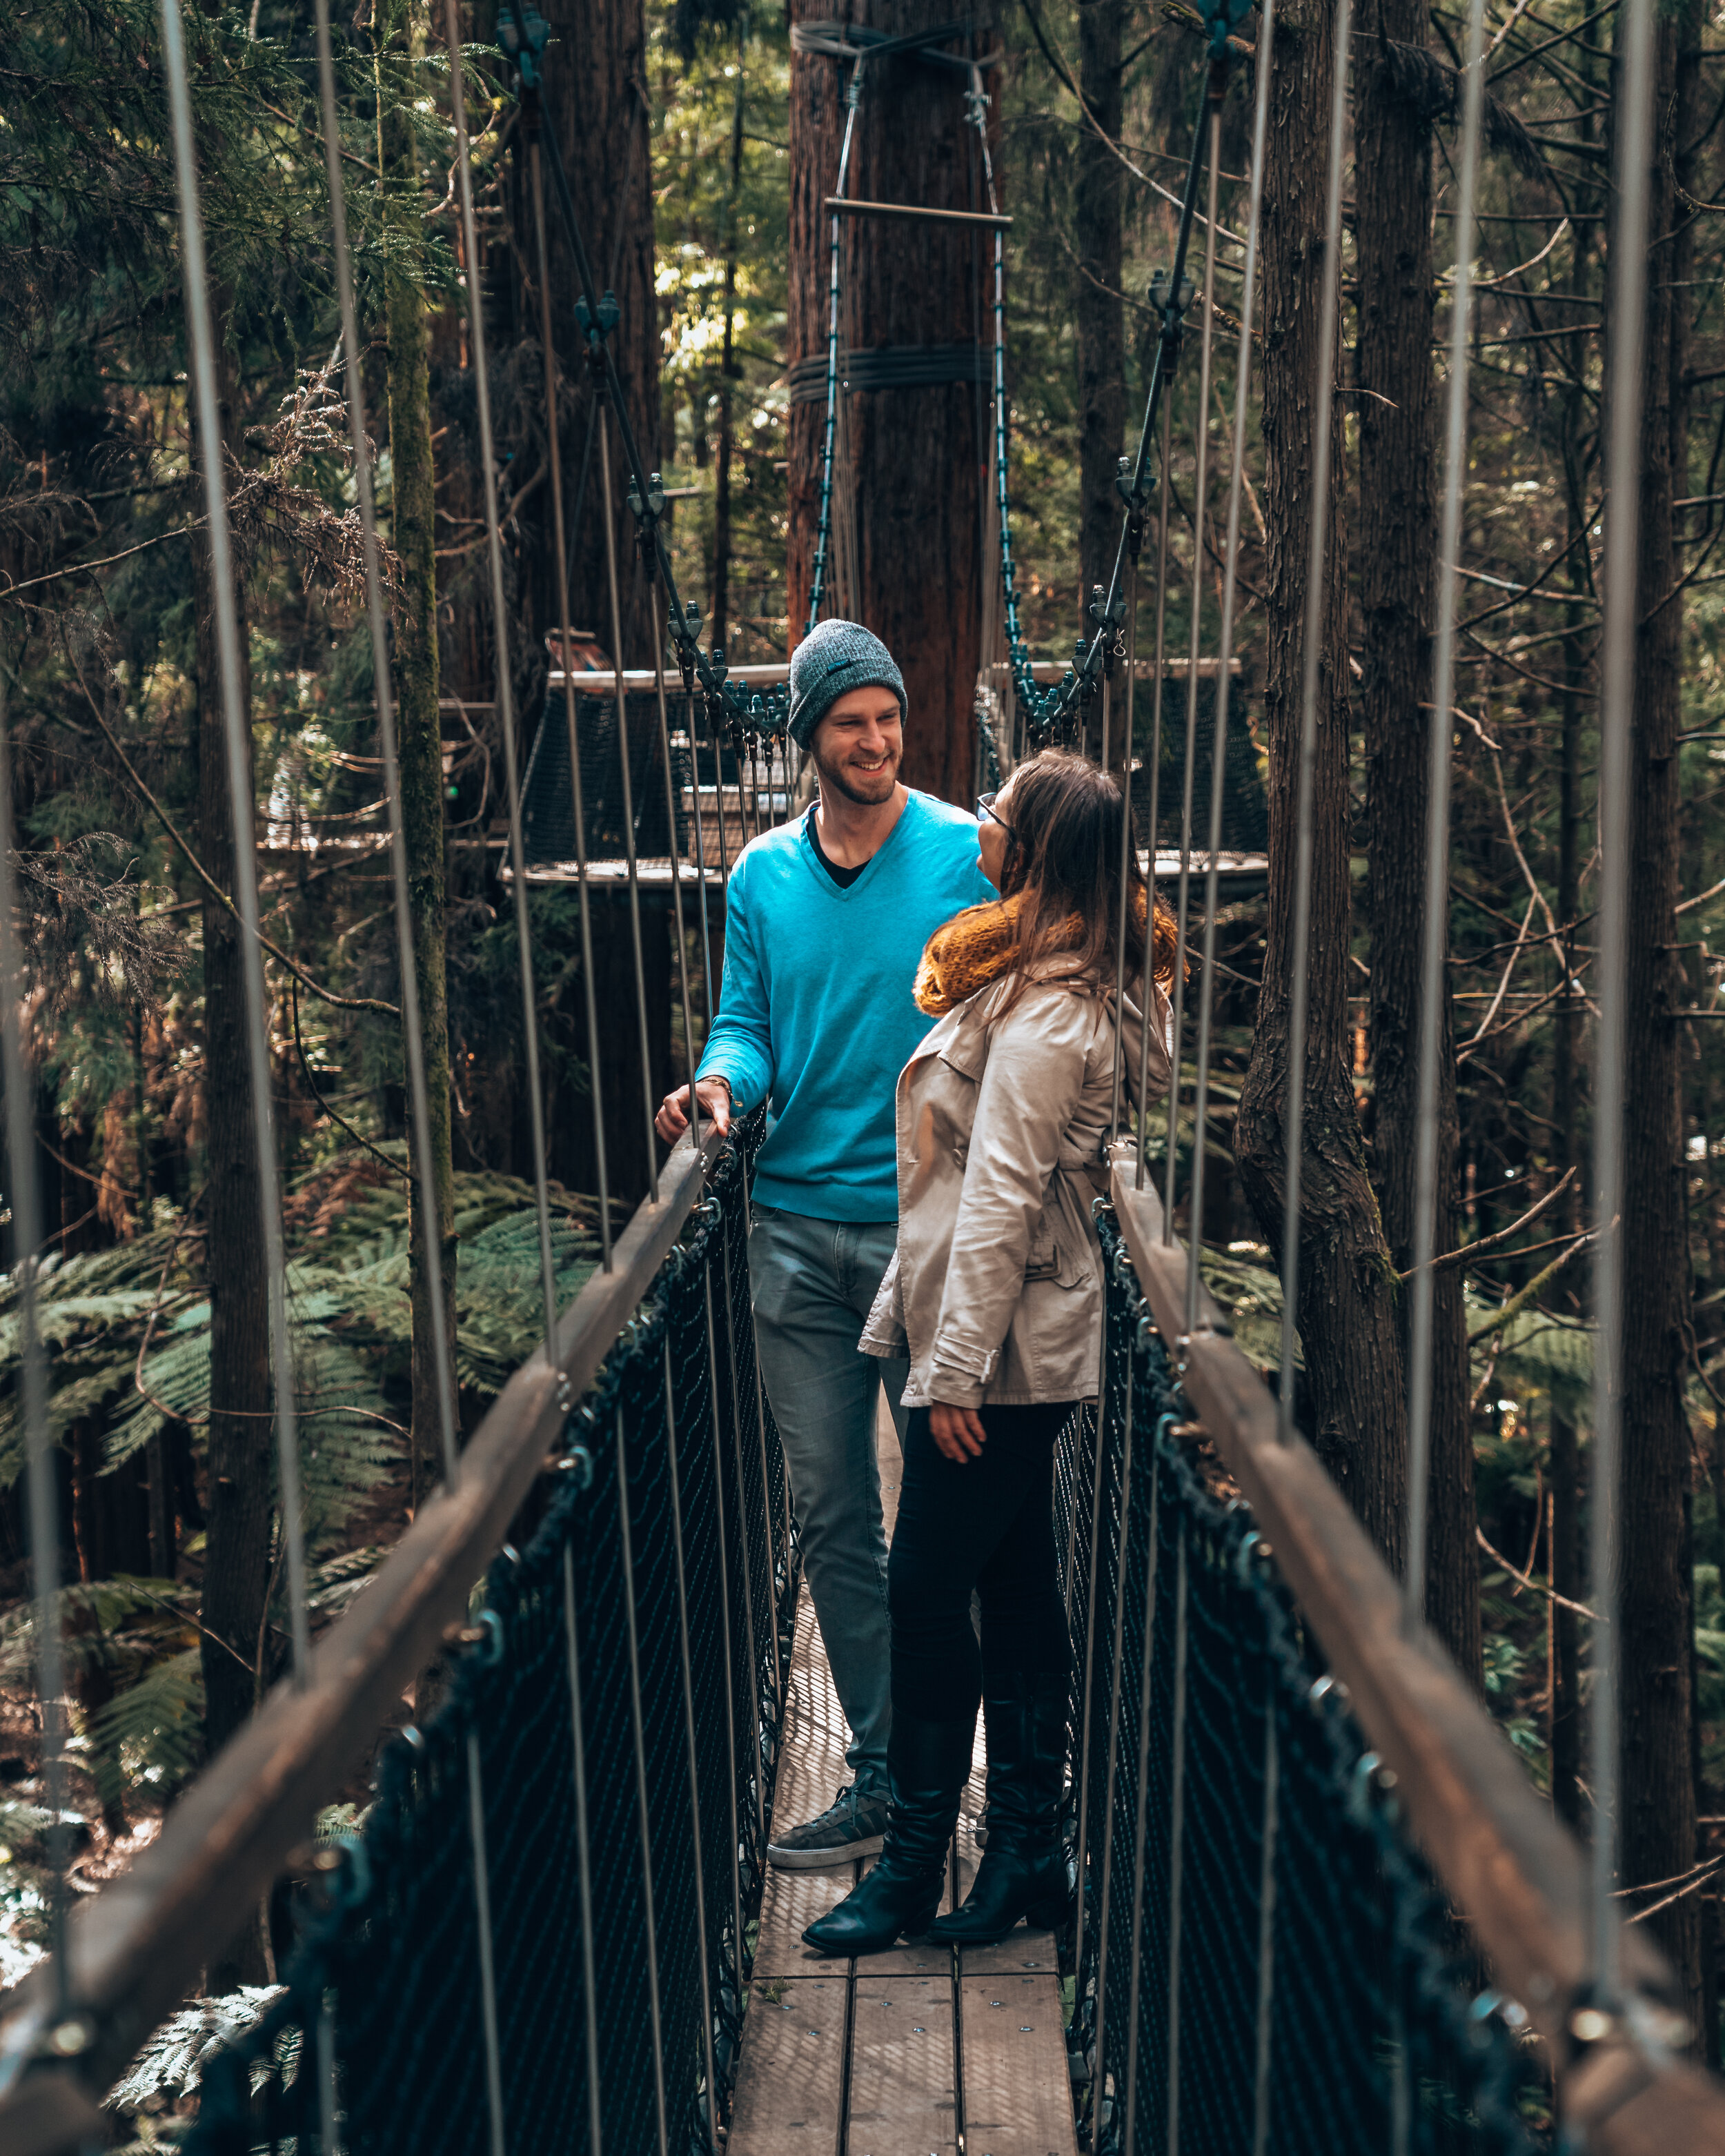 Redwood treewalk what to do rotorua New Zealand